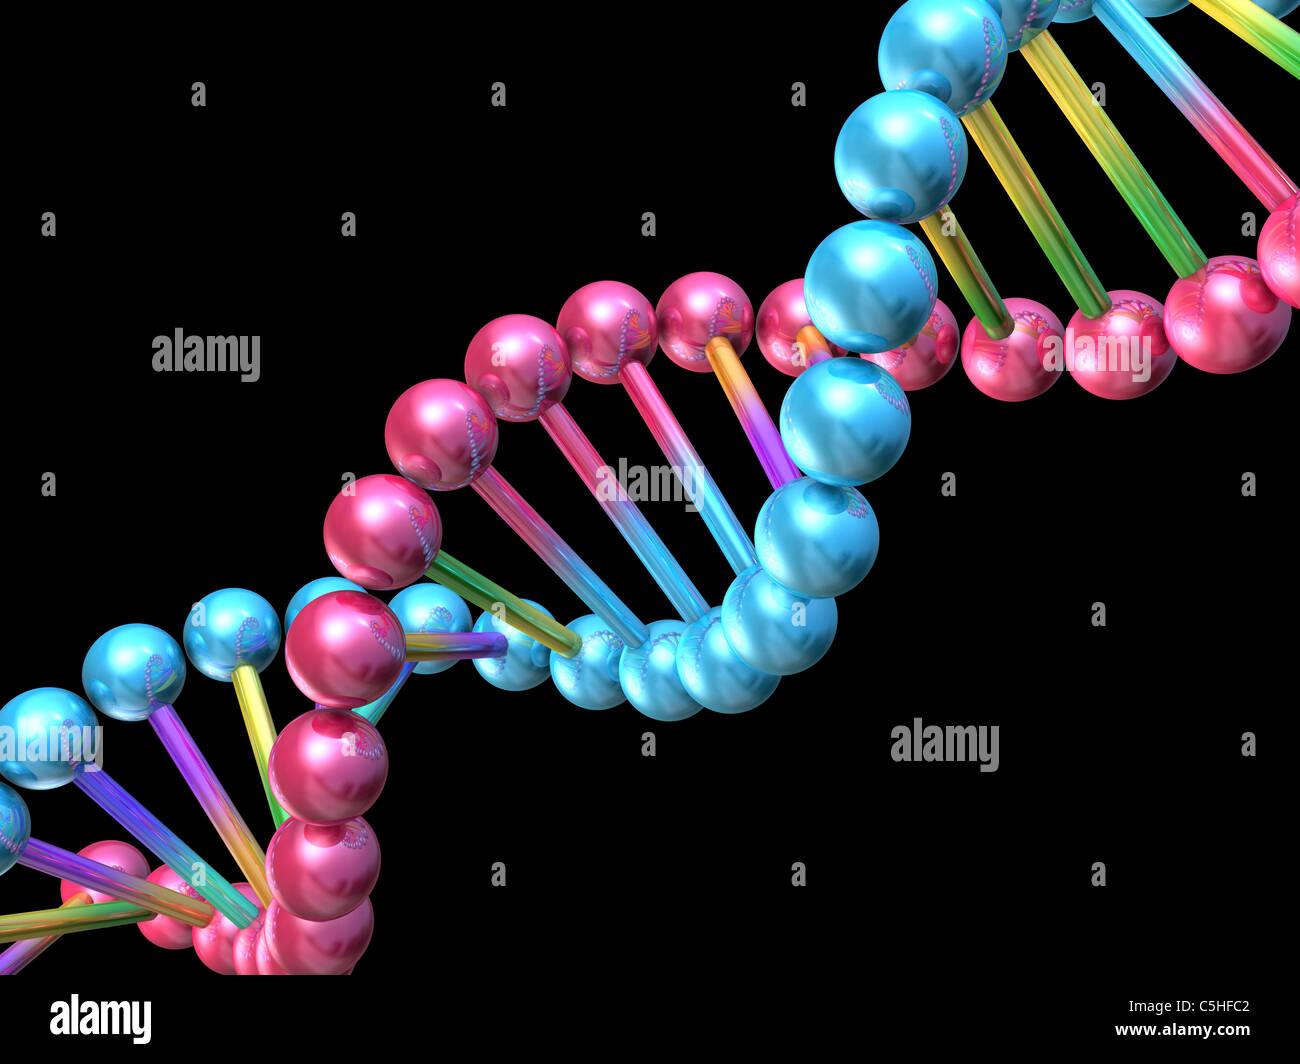 DNA-Molekül, Computer-Grafik Stockbild